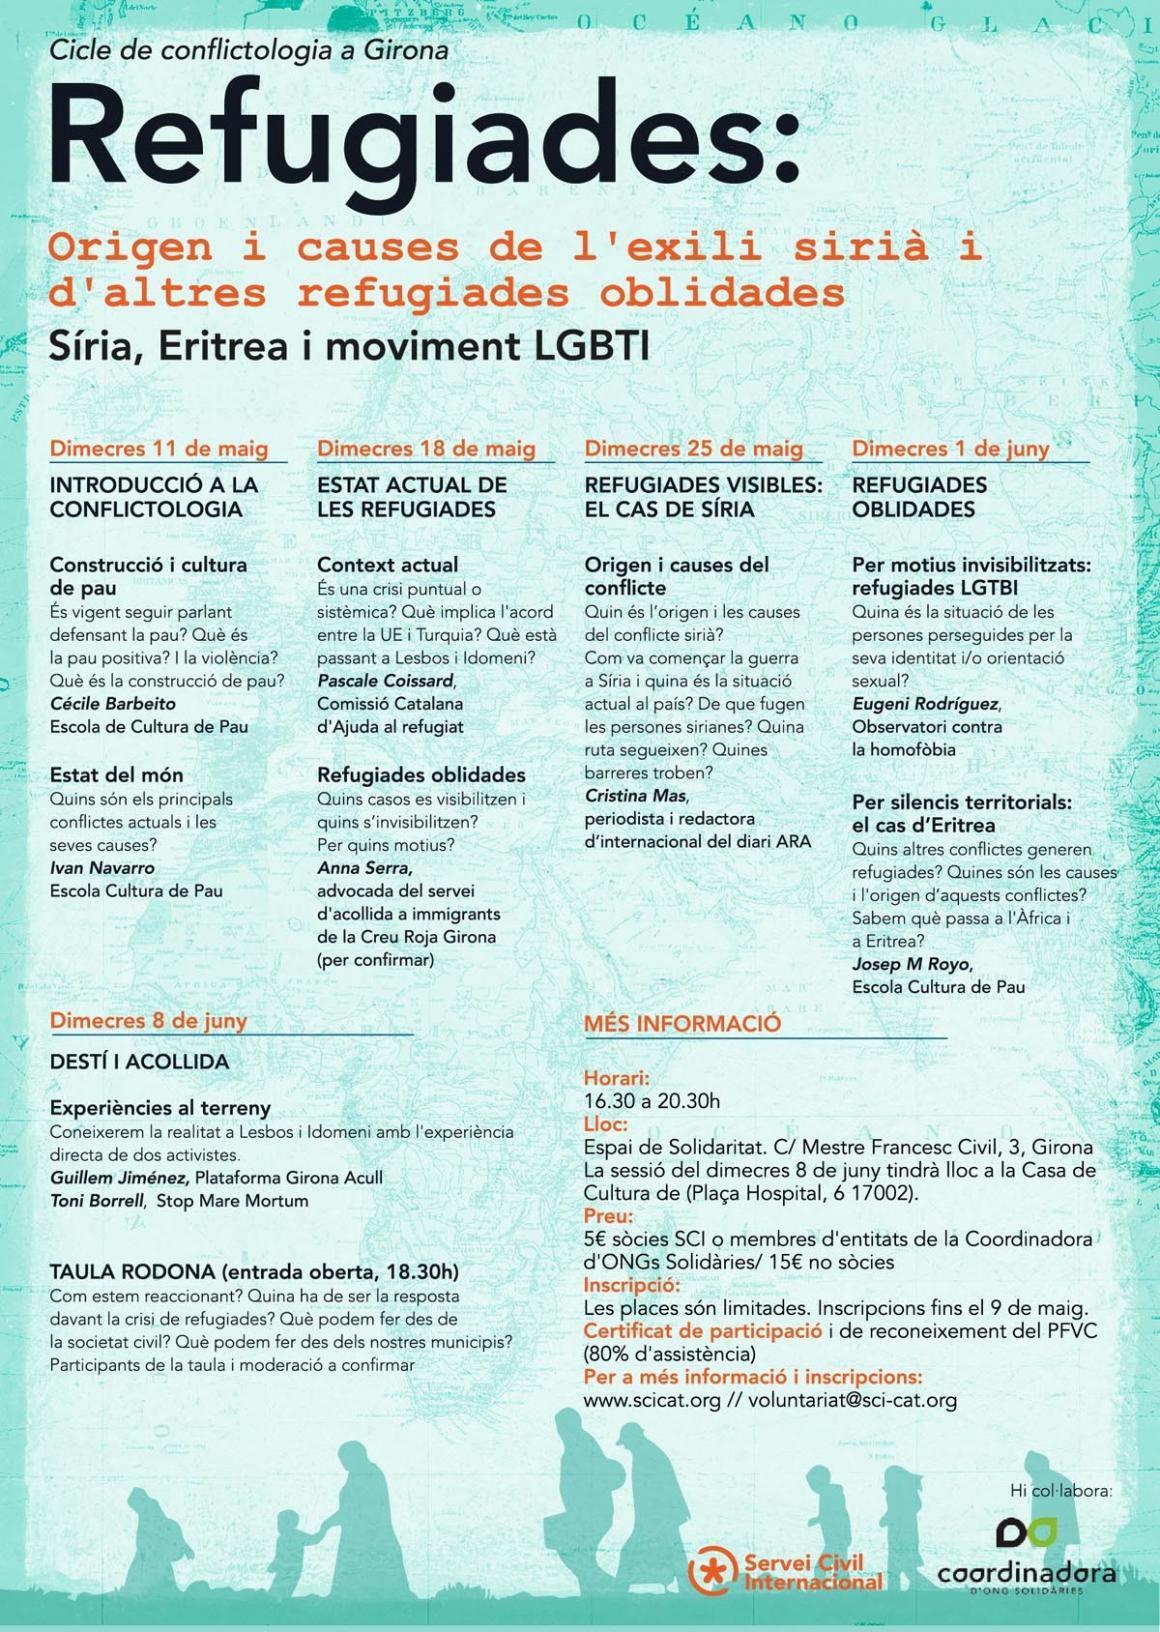 Curs de Conflictologia sobre Refugiades a Girona